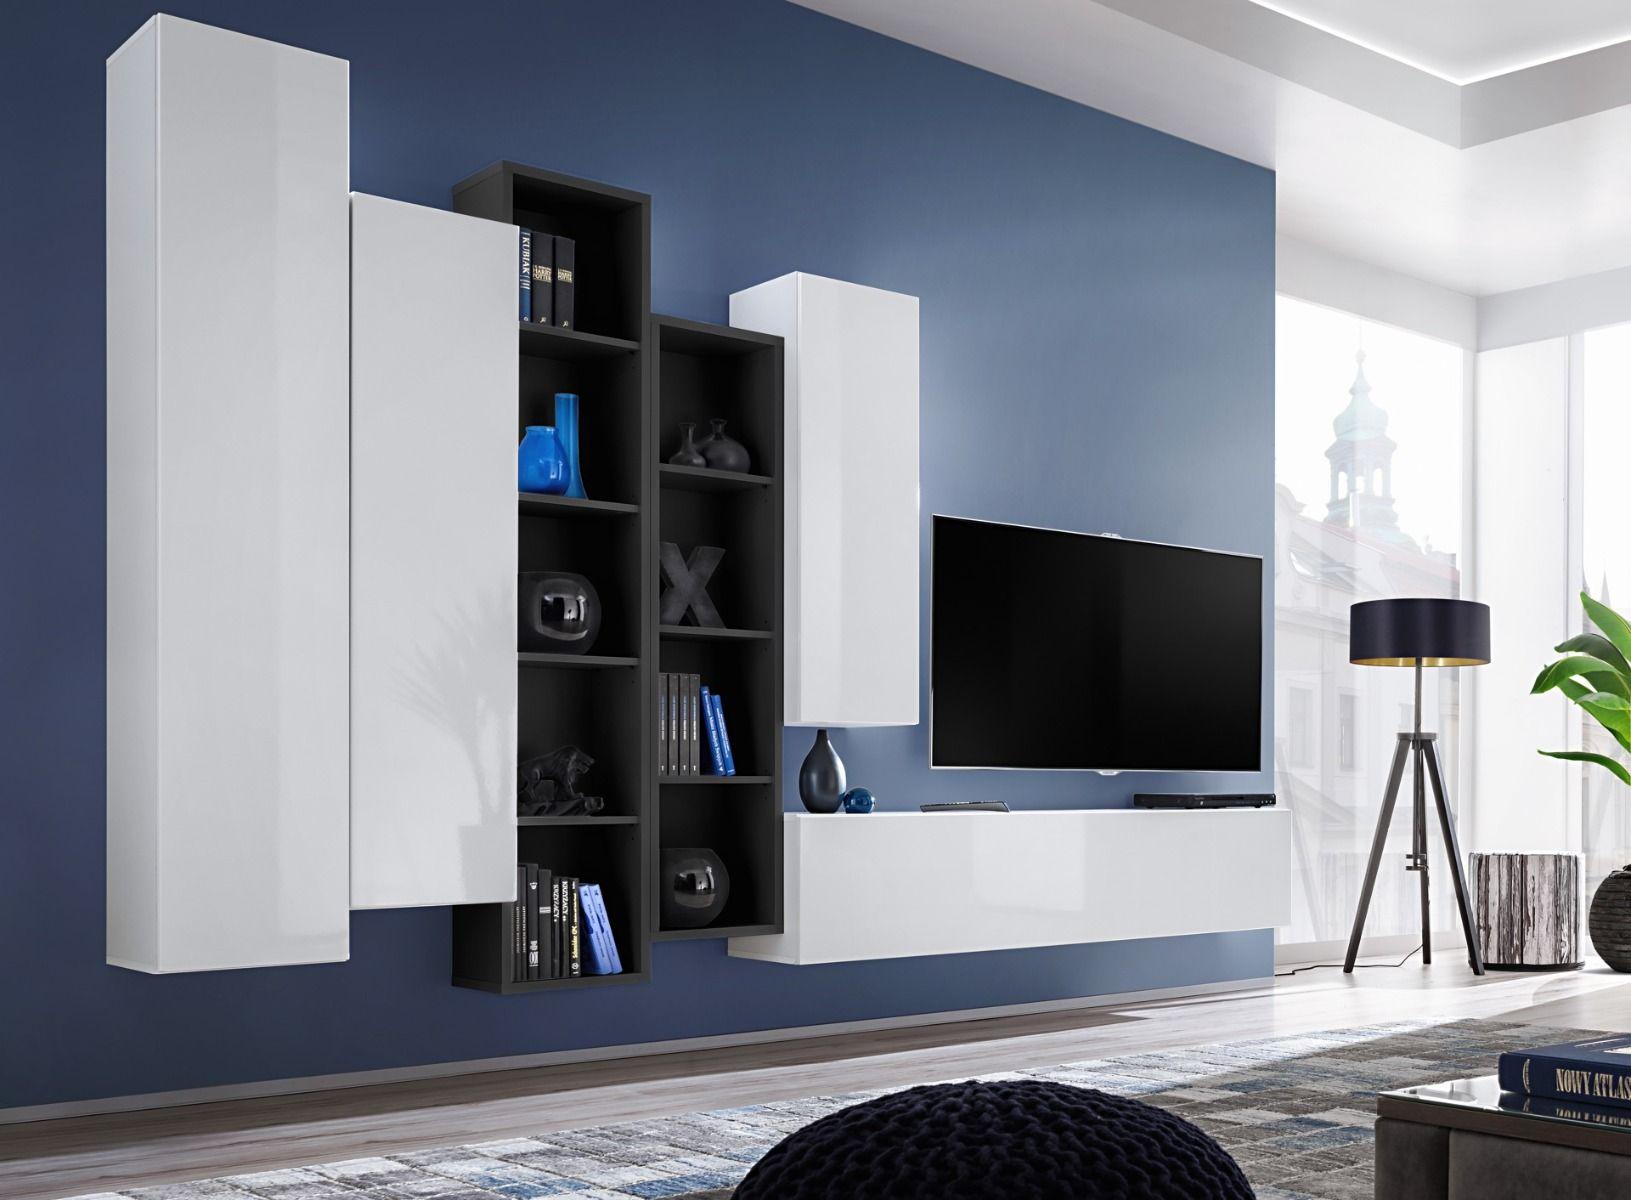 Meuble Tv Mural Meuble De Television Meuble Tv Meuble Tele Meuble Tv Hifi Meuble T Living Room Wall Units Tv Wall Unit